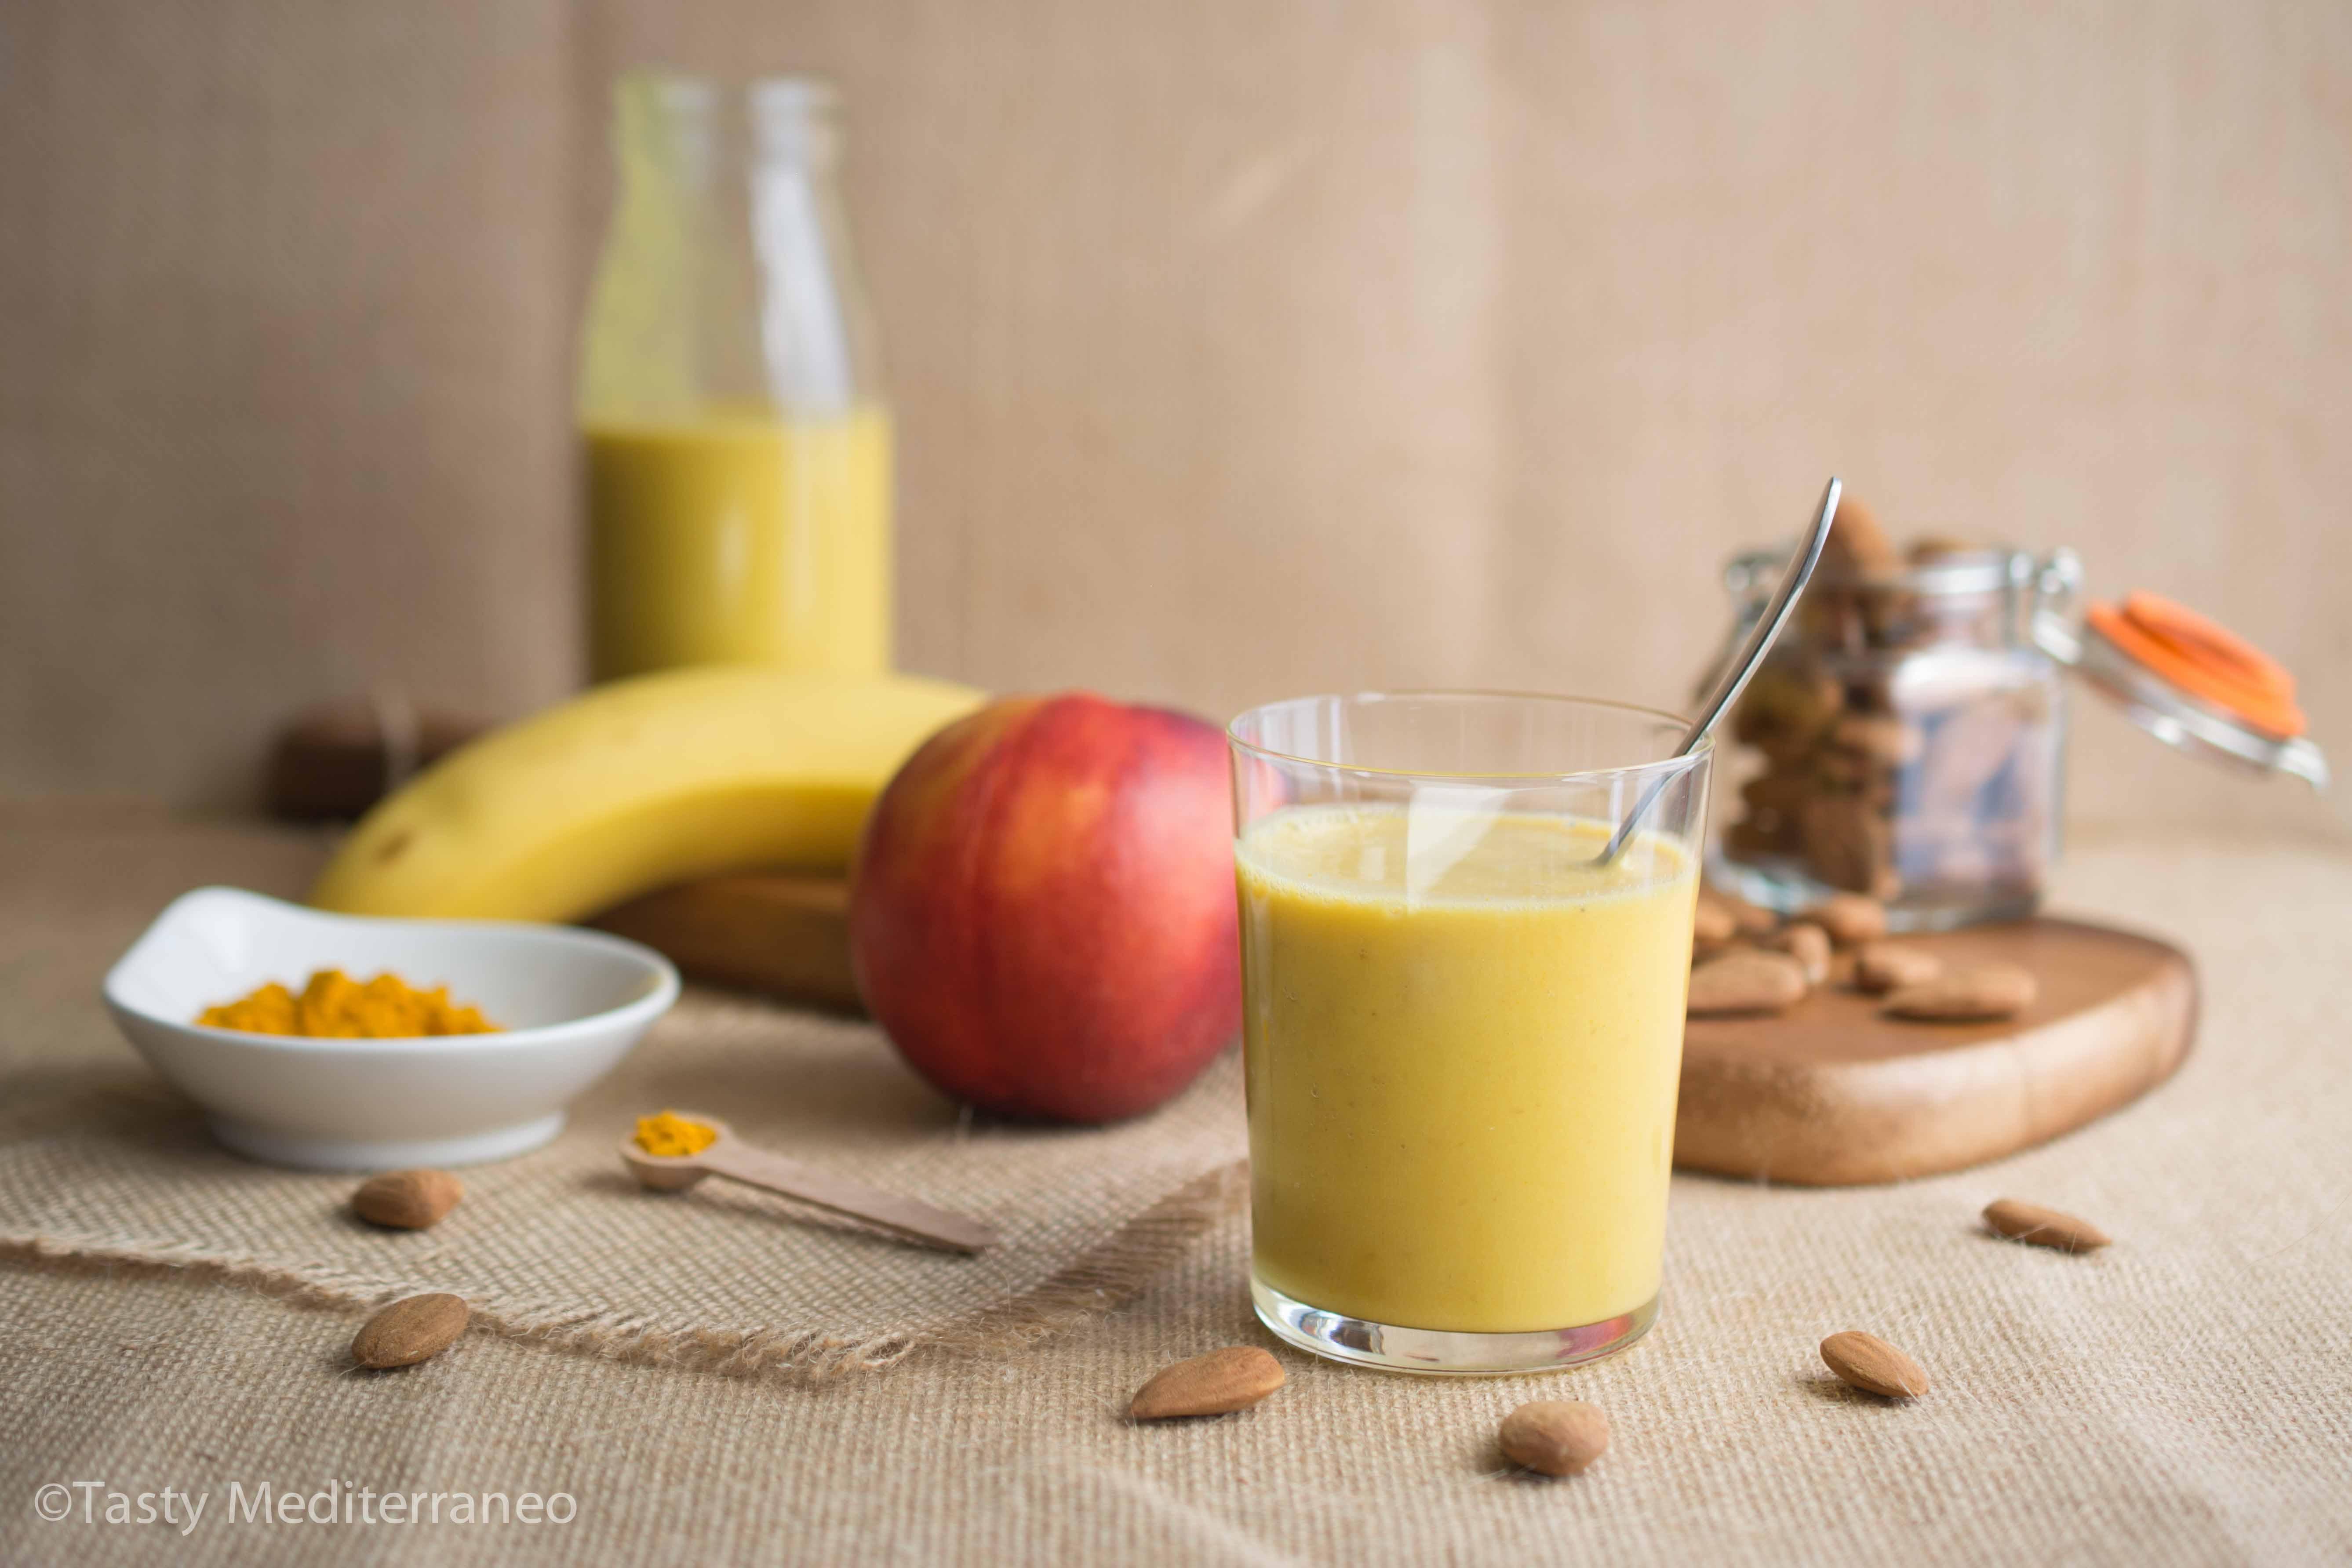 Tasty-Mediterraneo-turmeric-banana-nectarine-smoothie